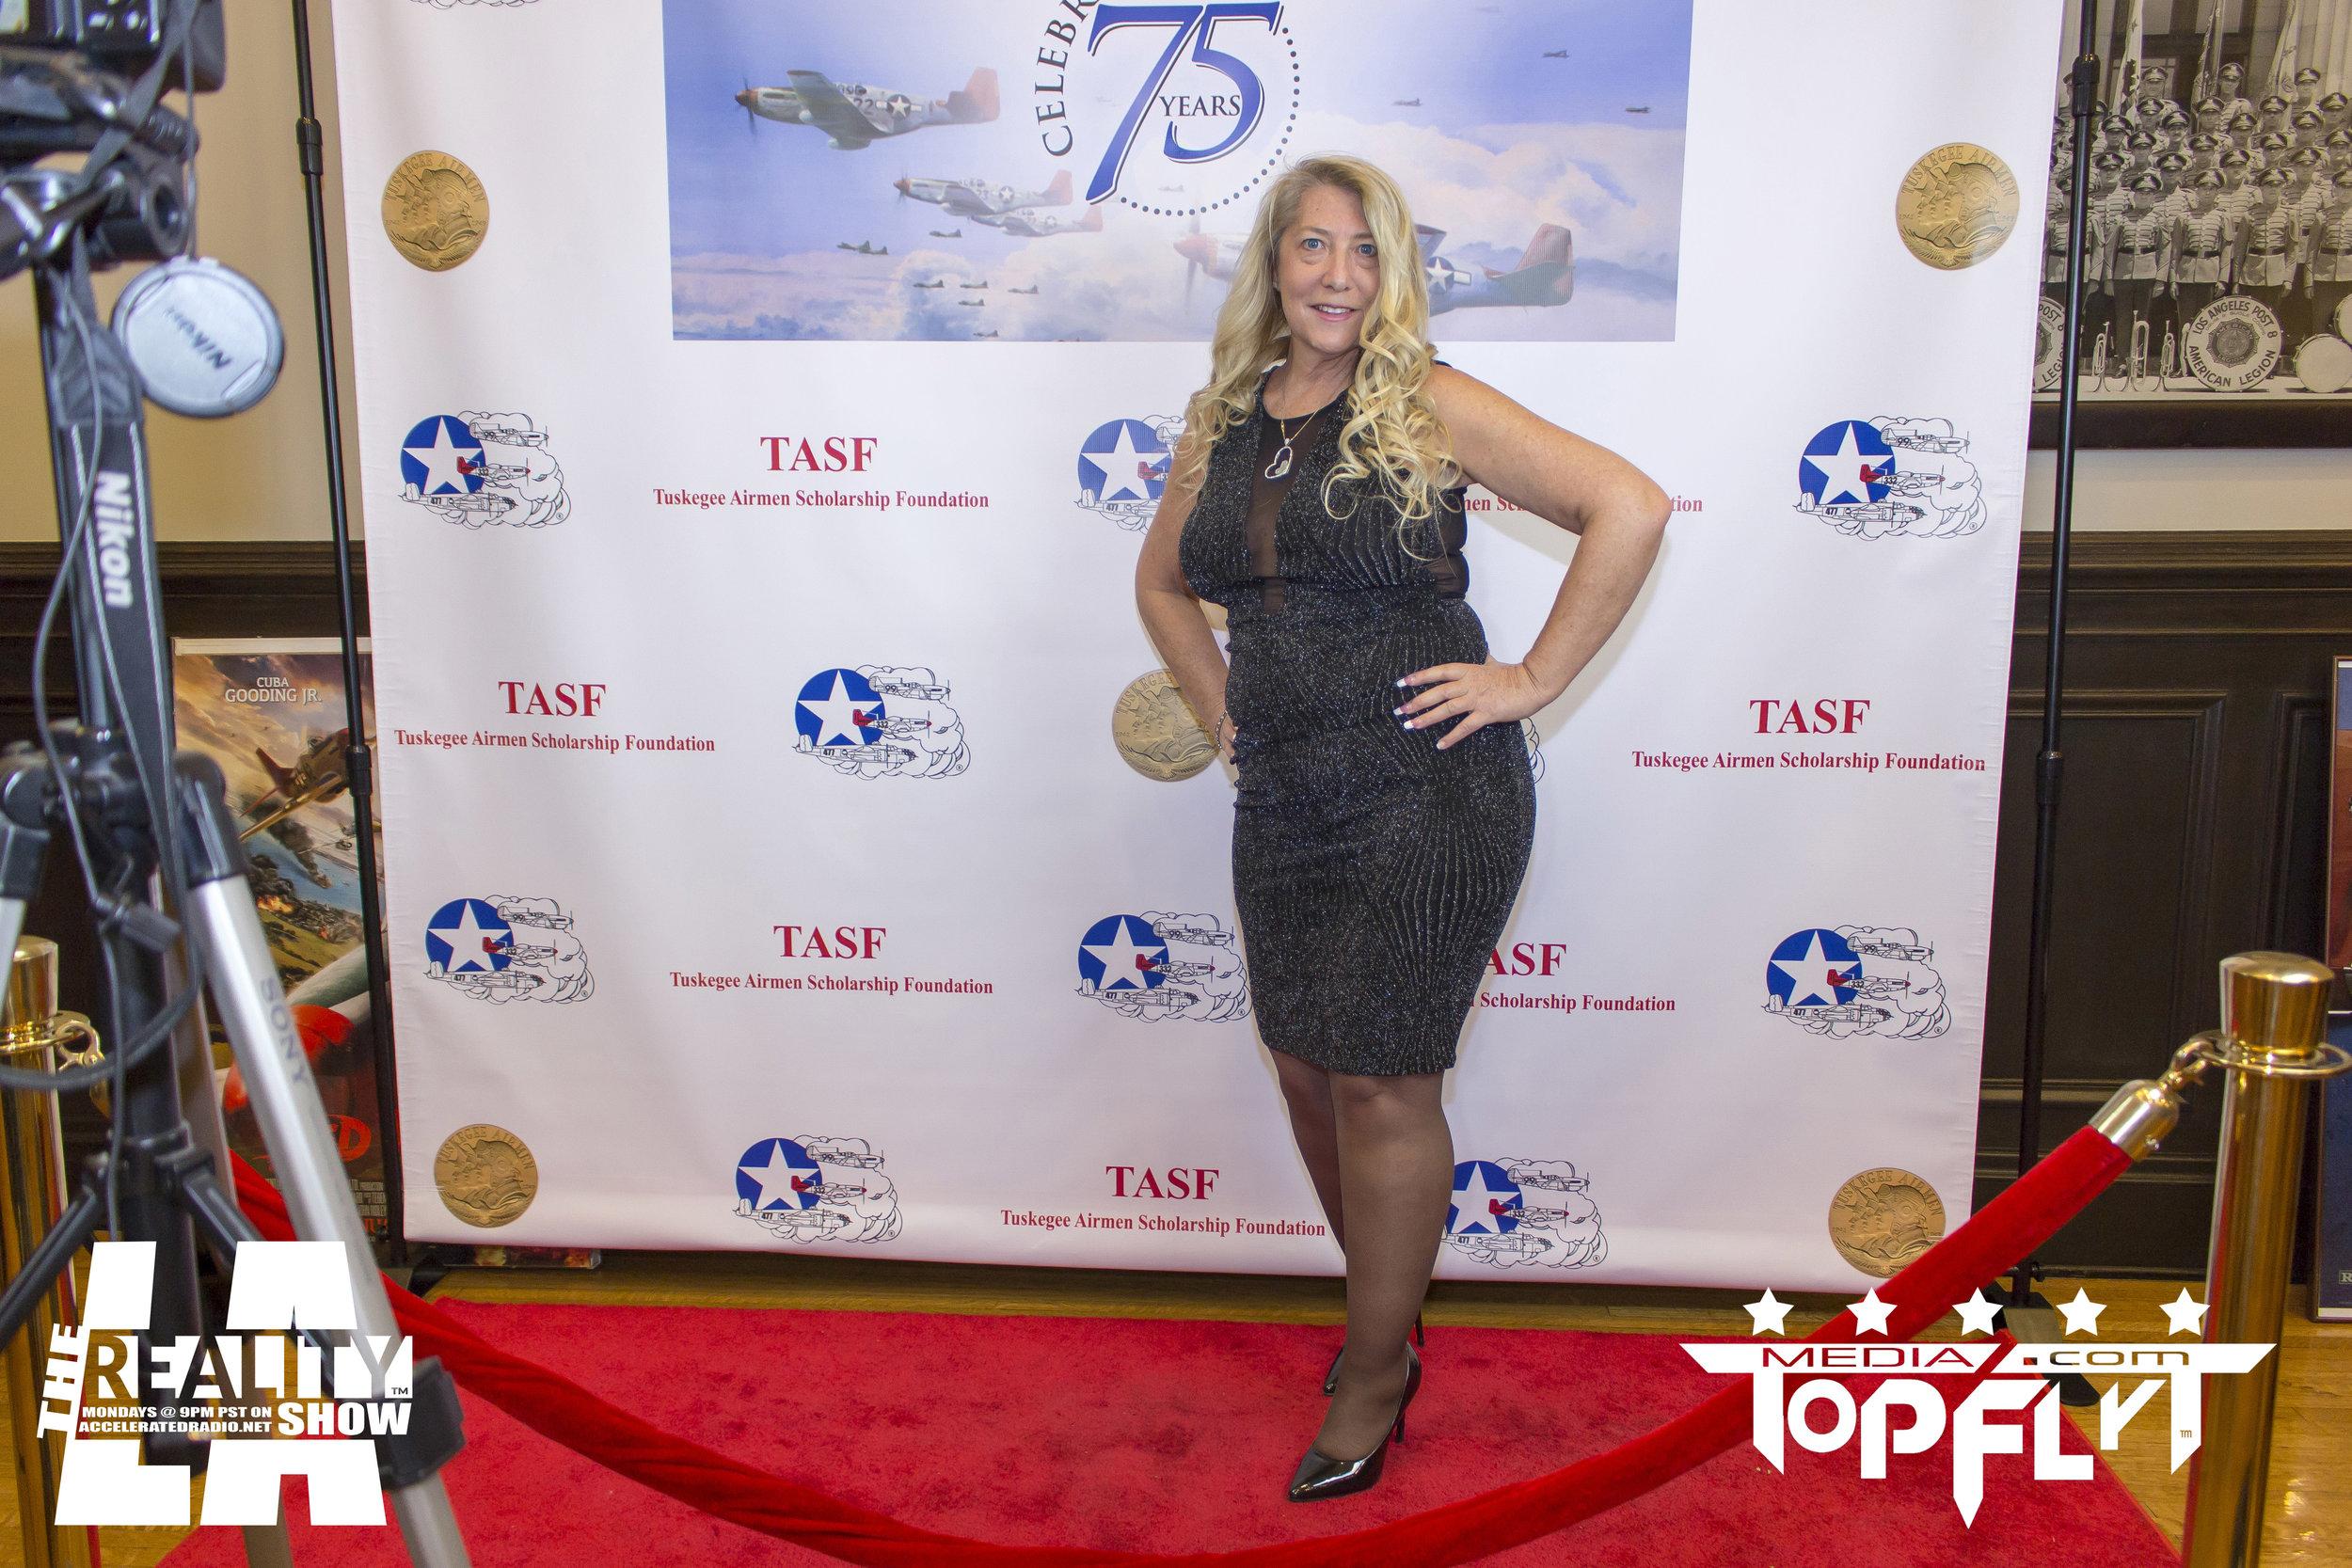 The Reality Show LA - Tuskegee Airmen 75th Anniversary VIP Reception_47.jpg